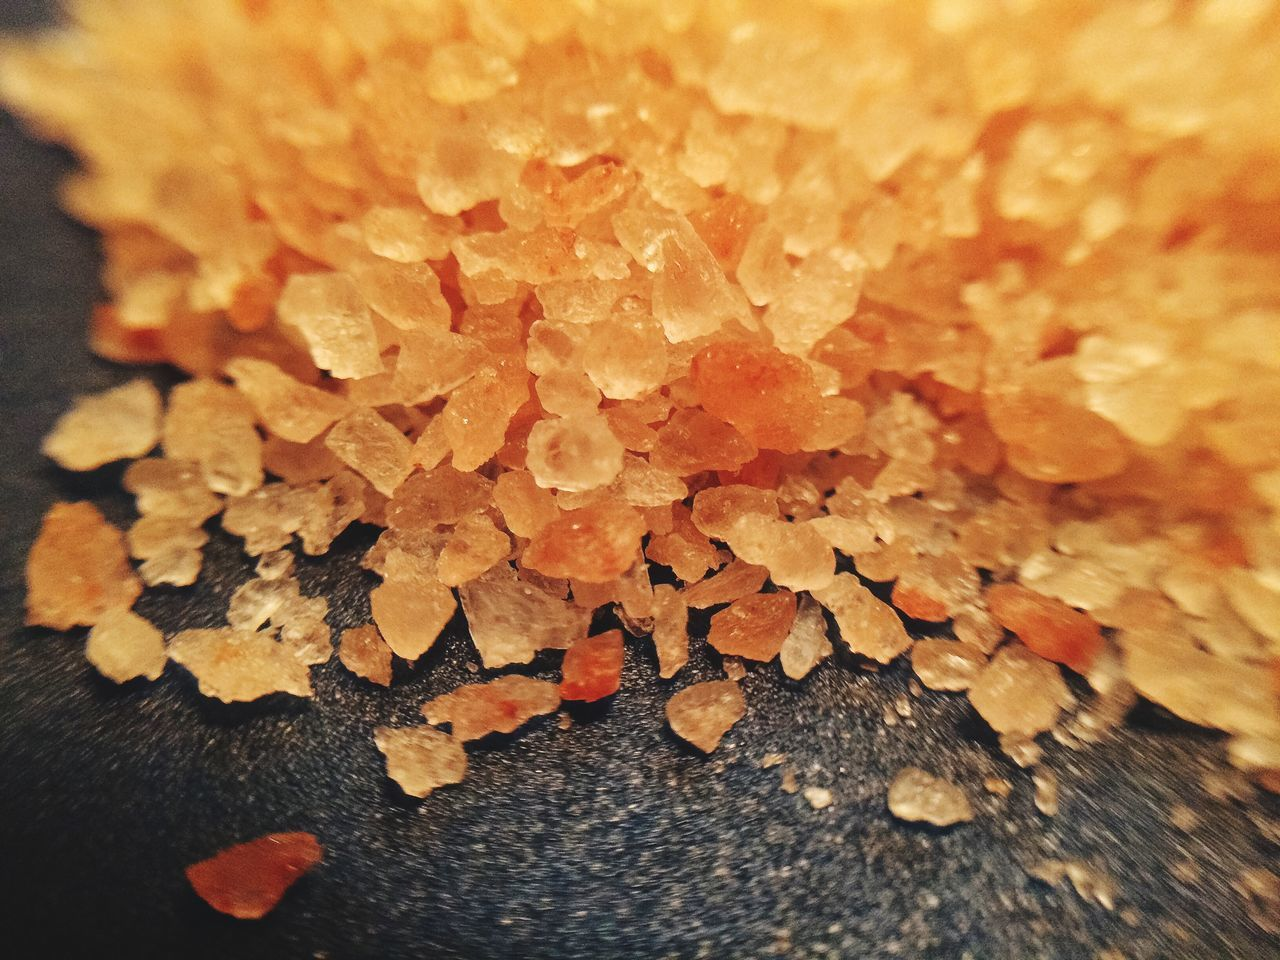 Himalayan salt Microscope Macro_collection Microcosm Backrounds Macrophotography Micro Photography Microcosmos Wallpaper Macro Photography Background Seasonings Seasoning Macro Salt Himalayan Salt